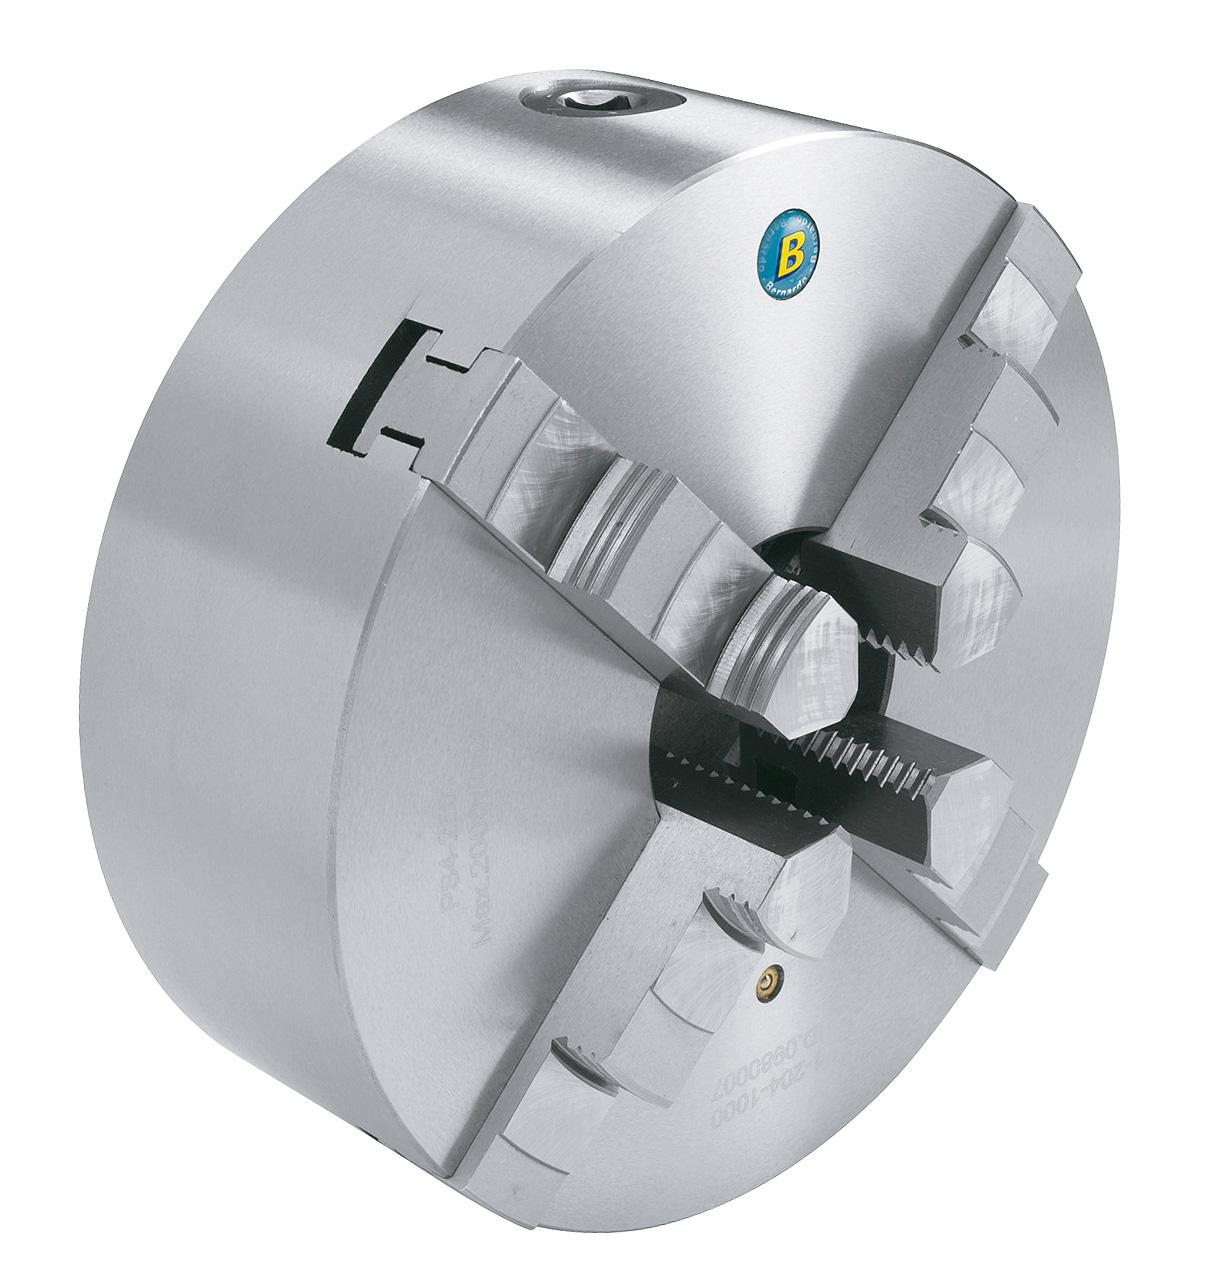 4 bakket centrerpatron standard DK12-250